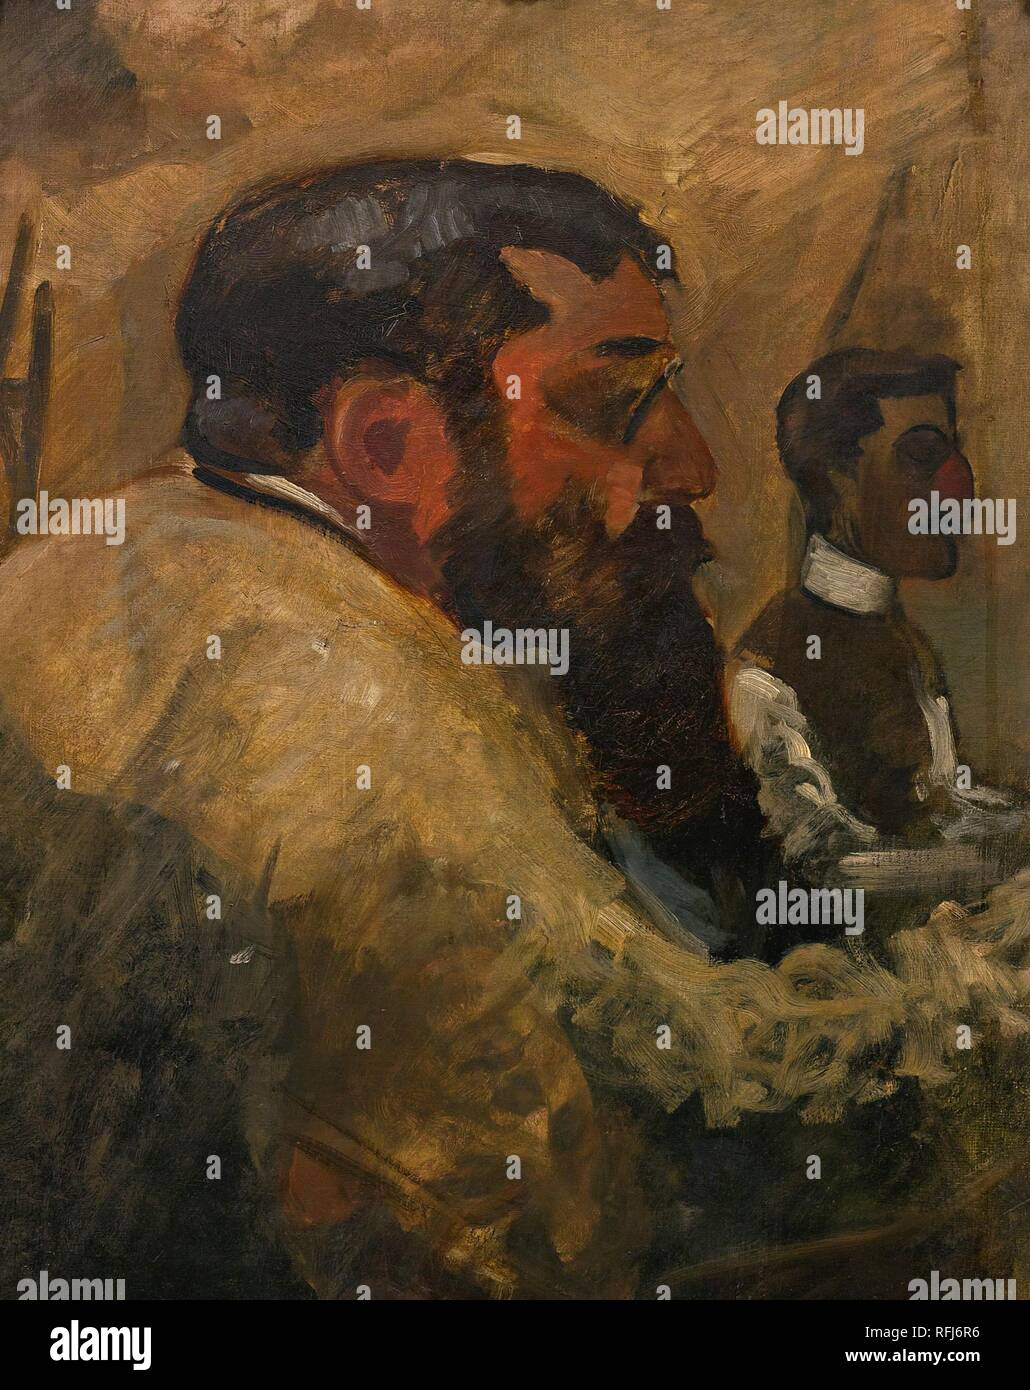 Ren Pierre Charles Princeteau 1840 - 1914 DEUX ARTISTES PEIGNANT.jpg - RFJ6R6 - Stock Image